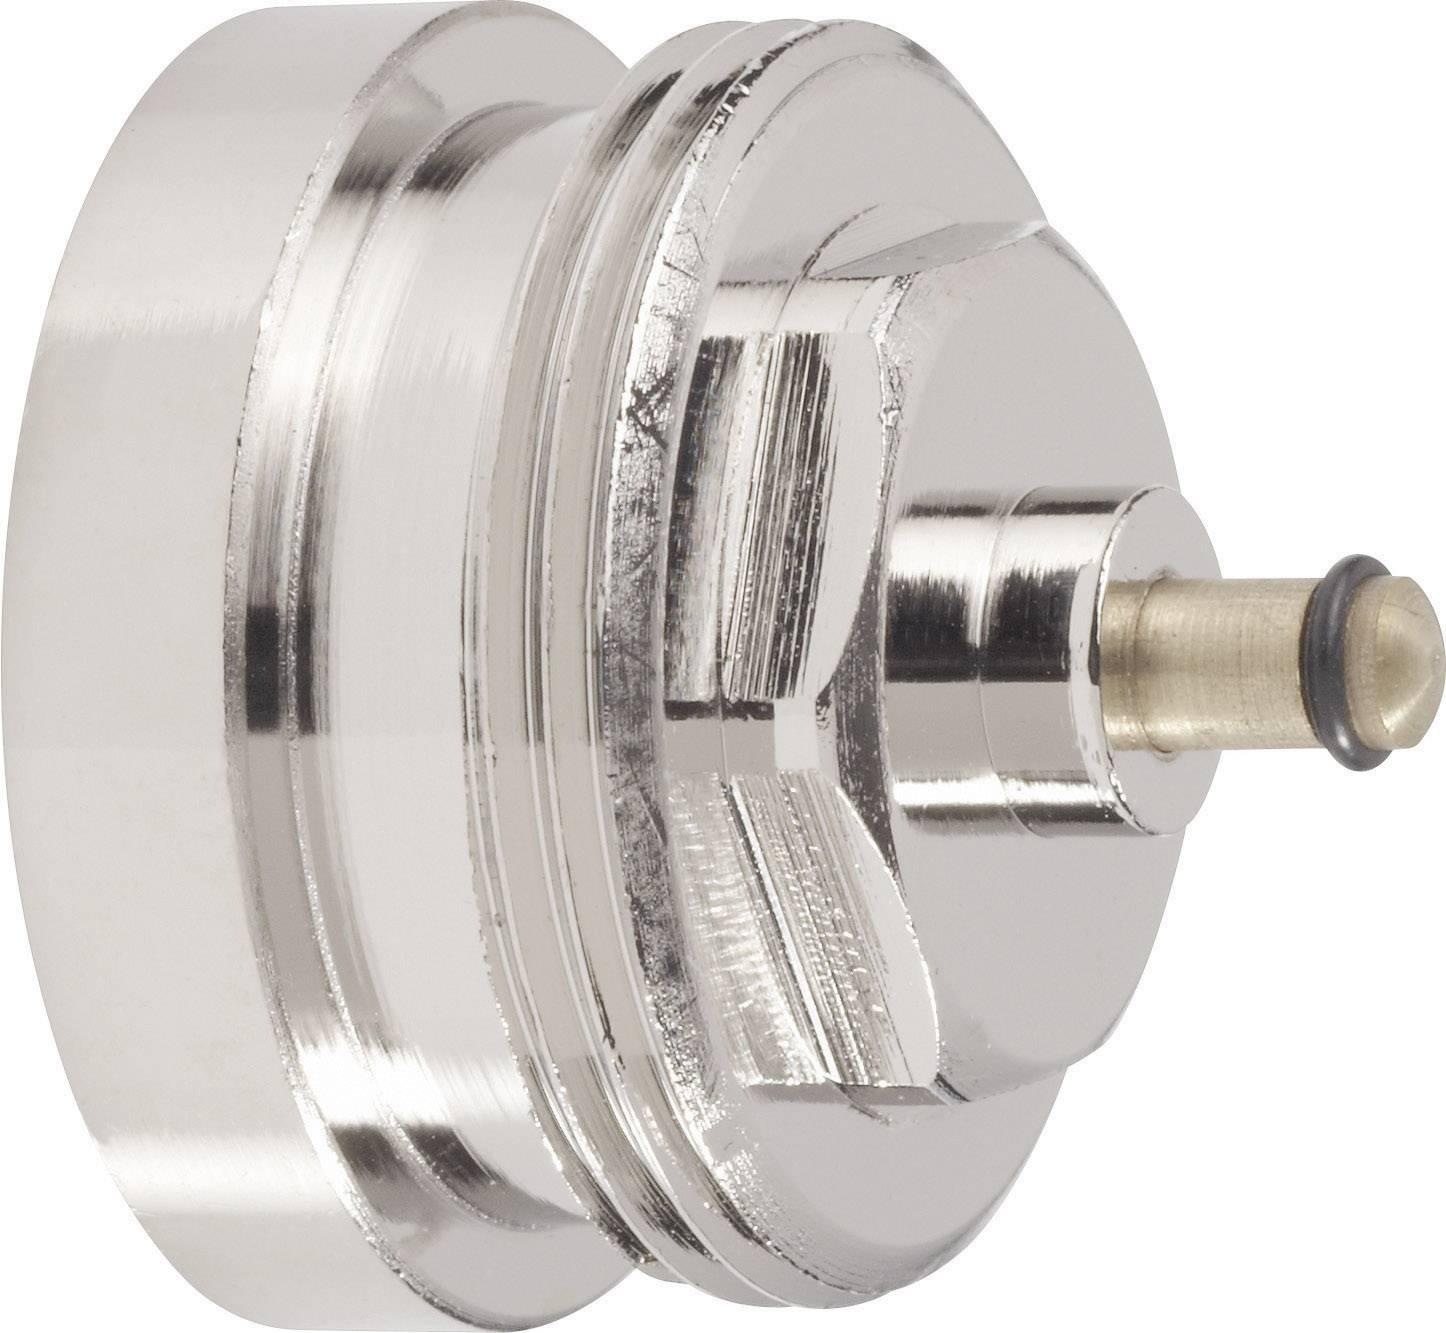 Mosadzný adaptér termostatu 700 100 004 vhodný pre Herz, M28 x 1.5